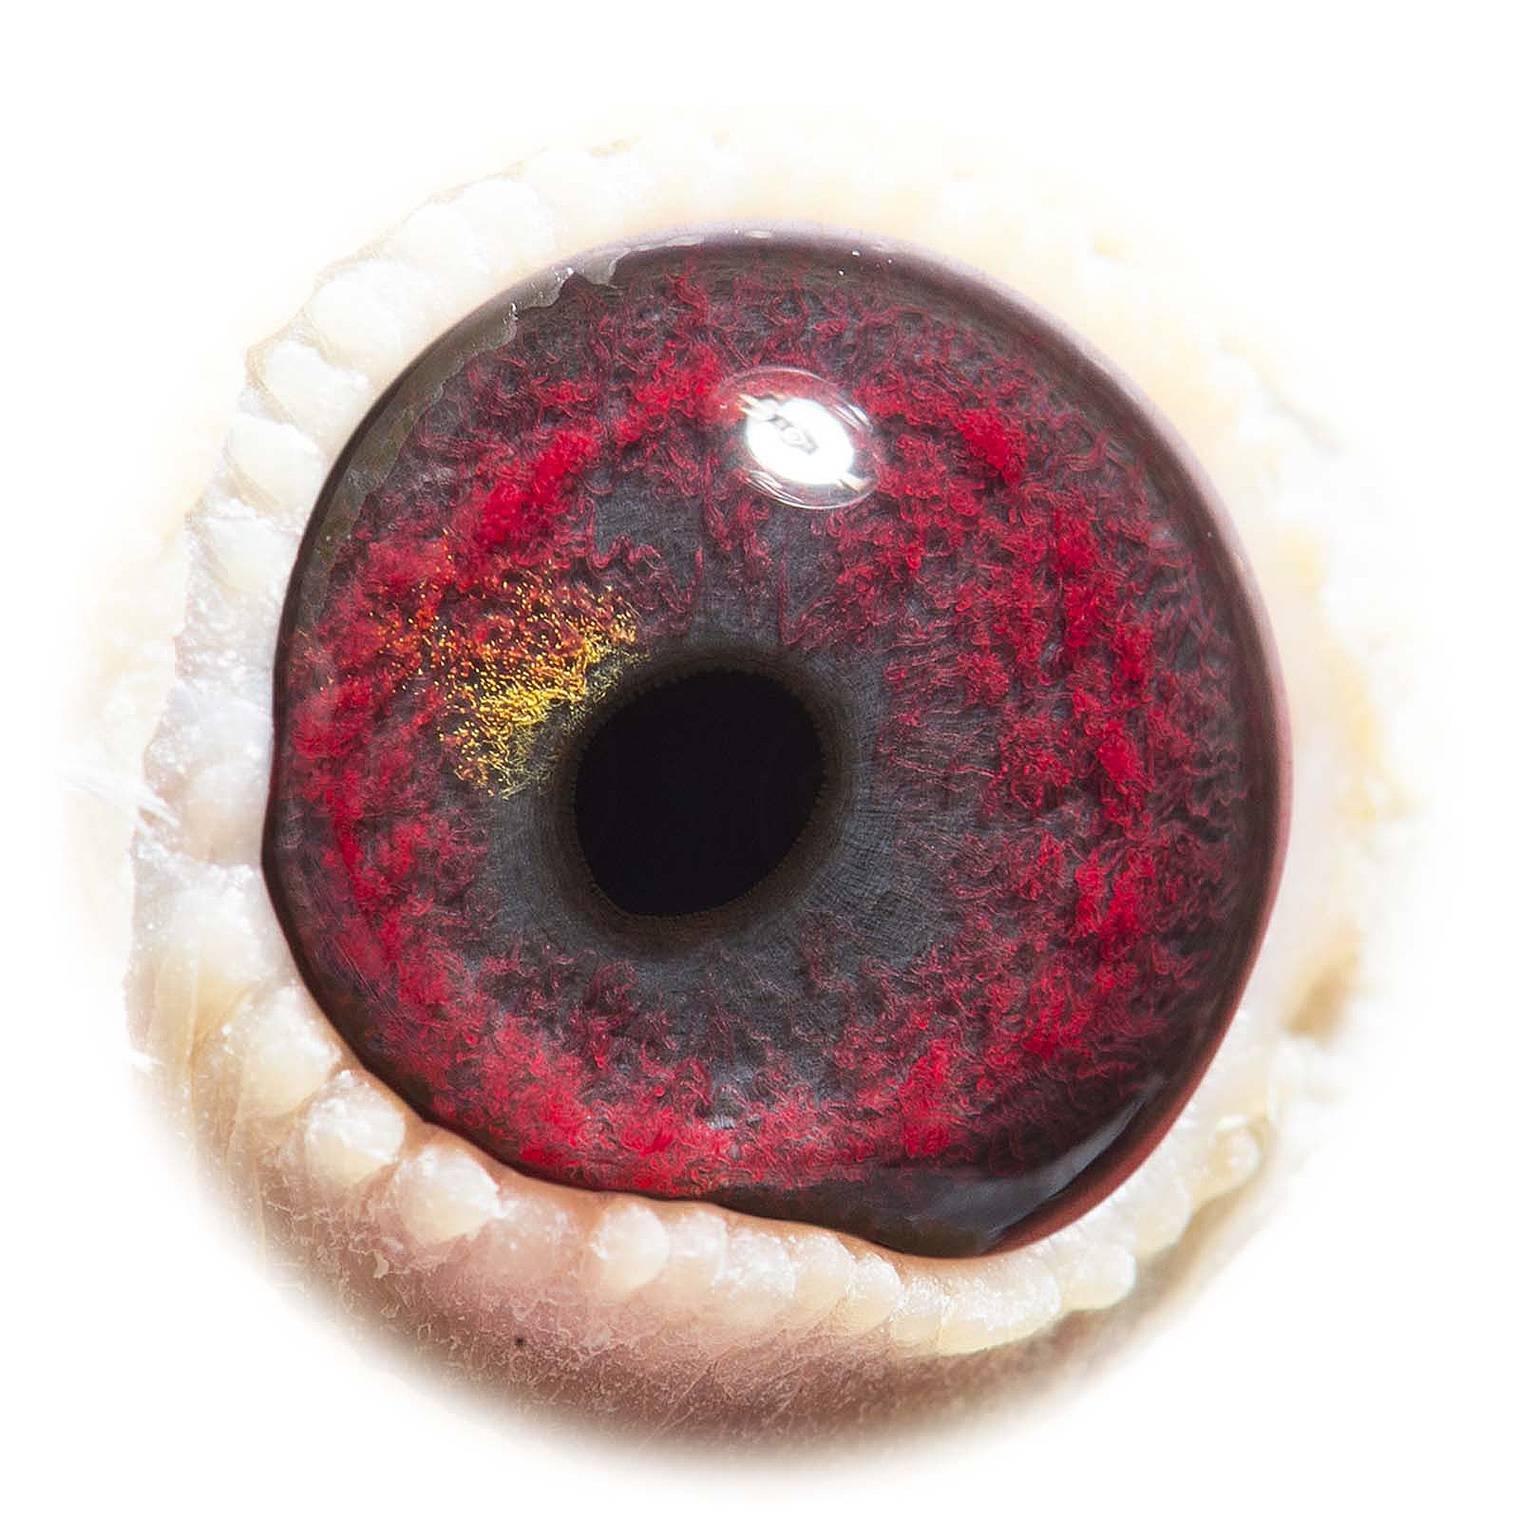 GB15-P30592_eye_1